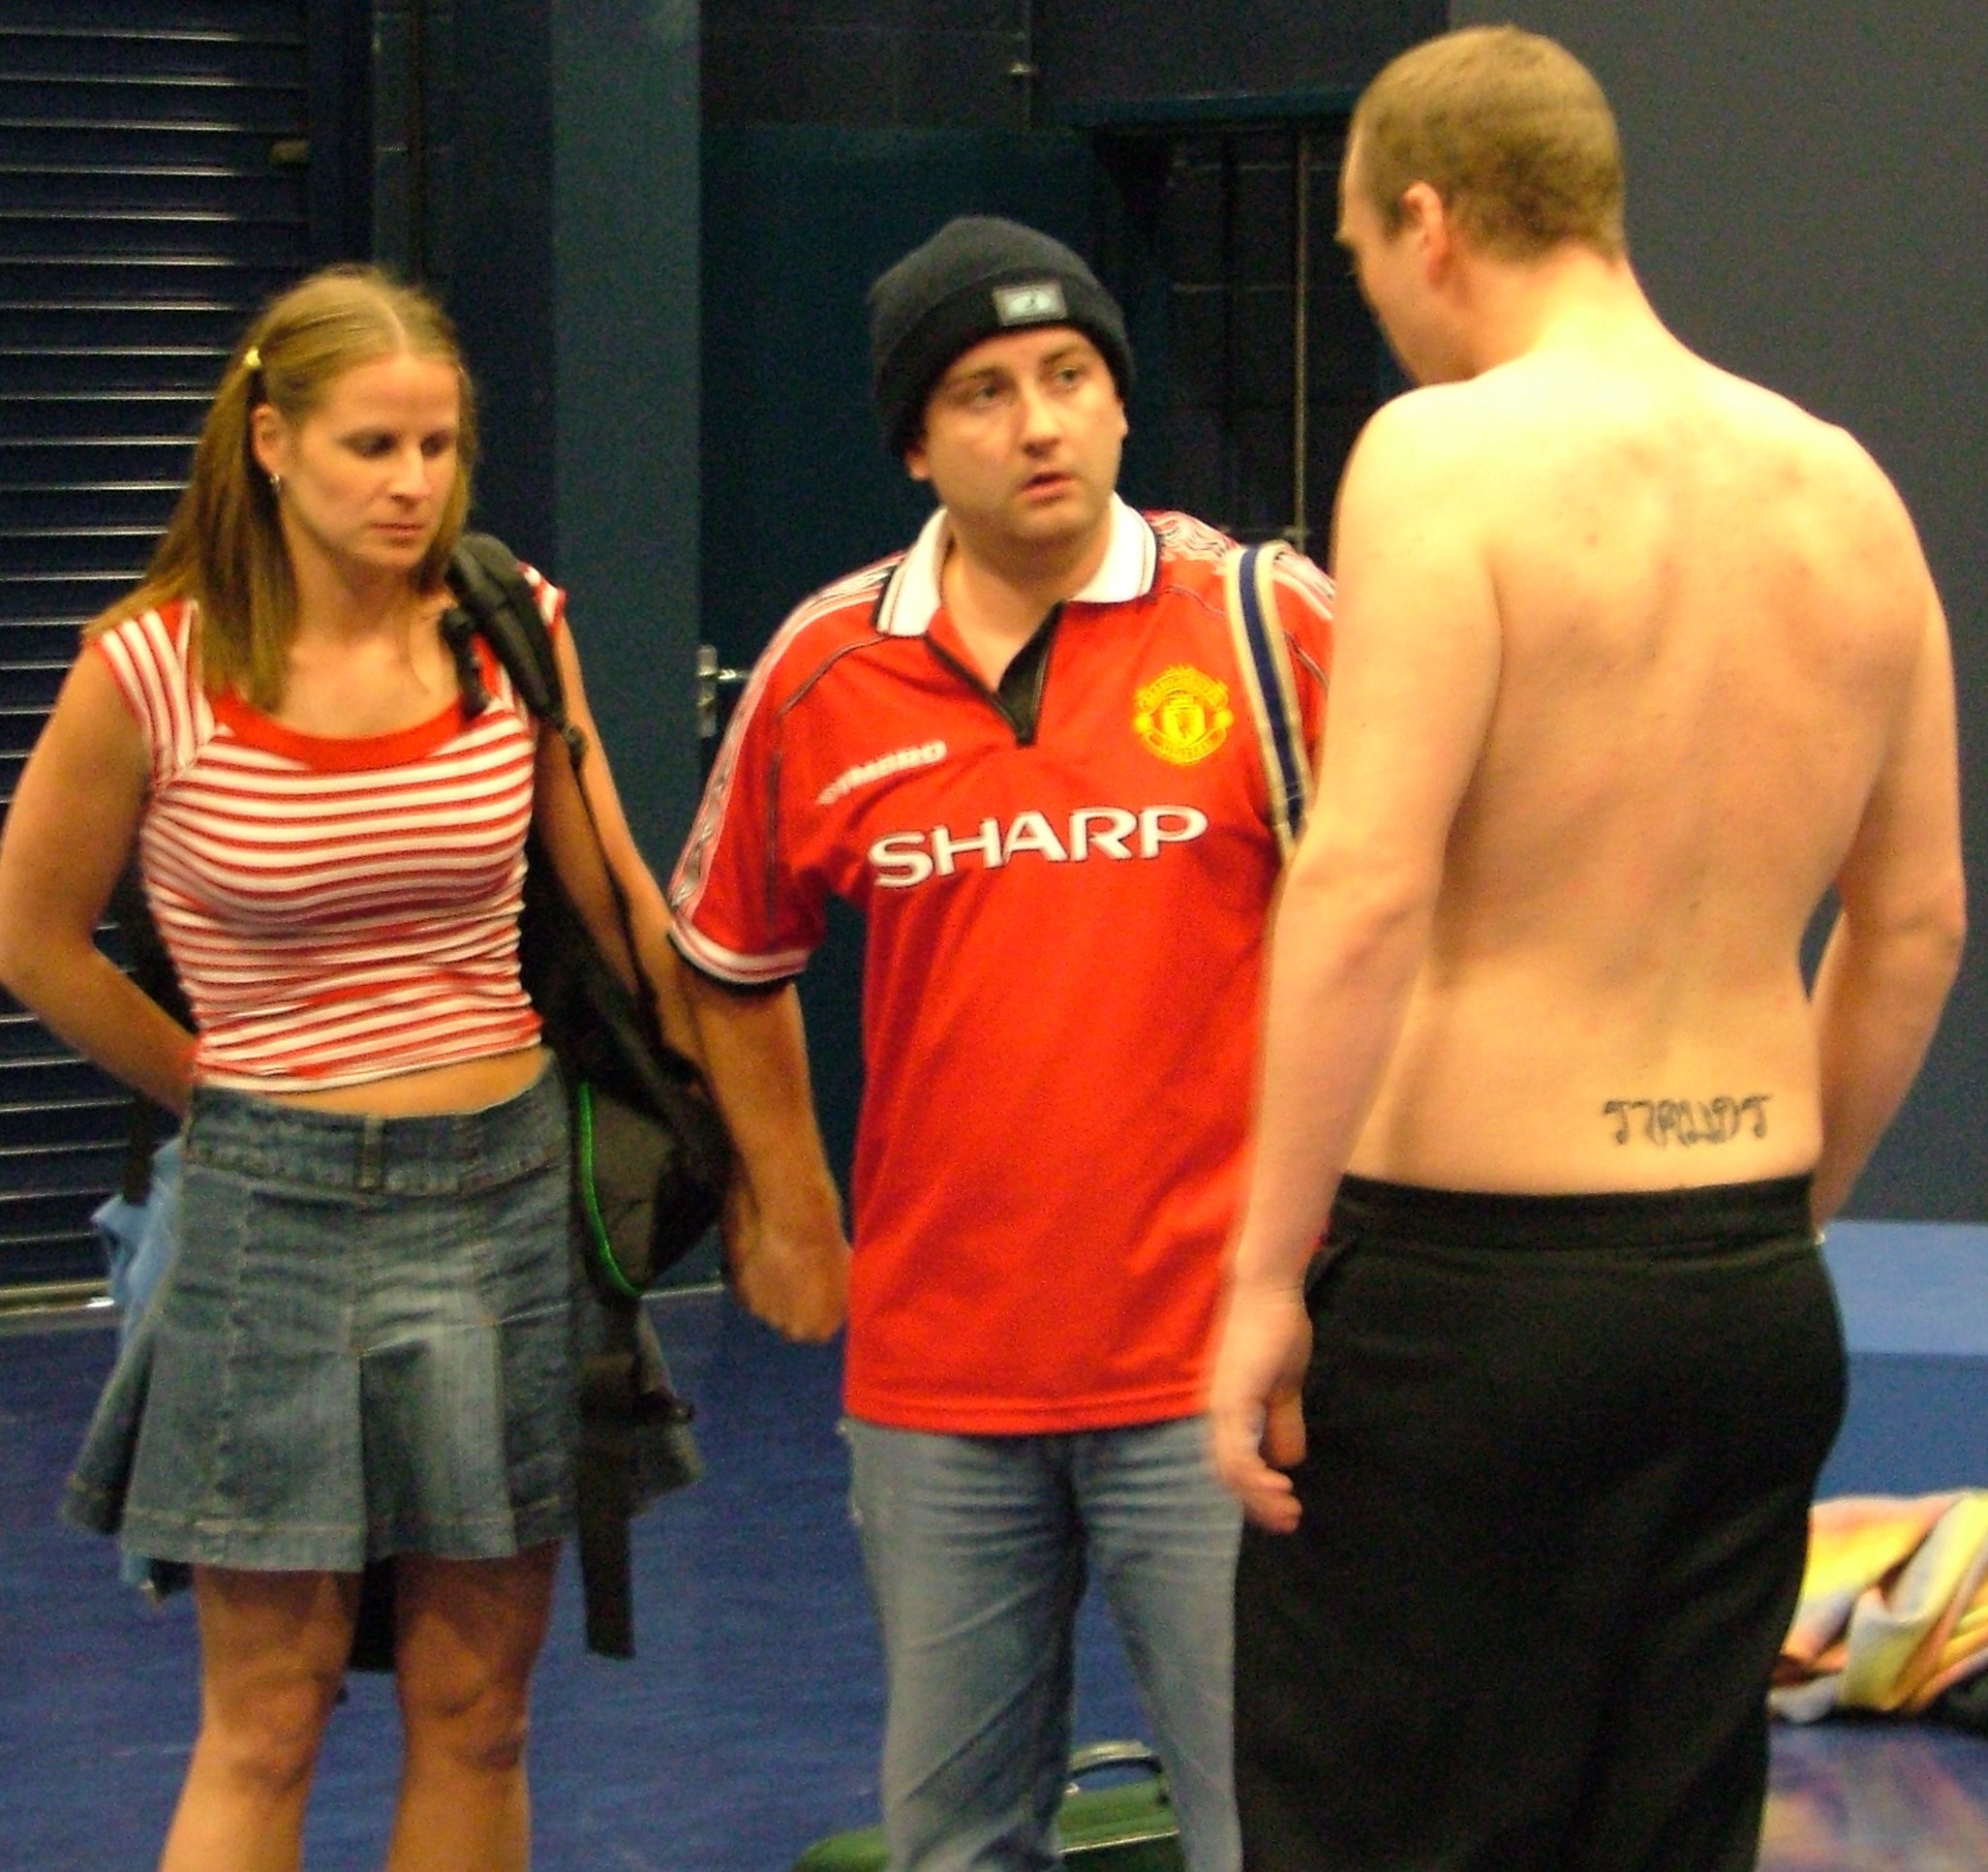 Hilary Jane, Steve Kelly & Tommy Dickinson as Katy, Carl & Stuart.